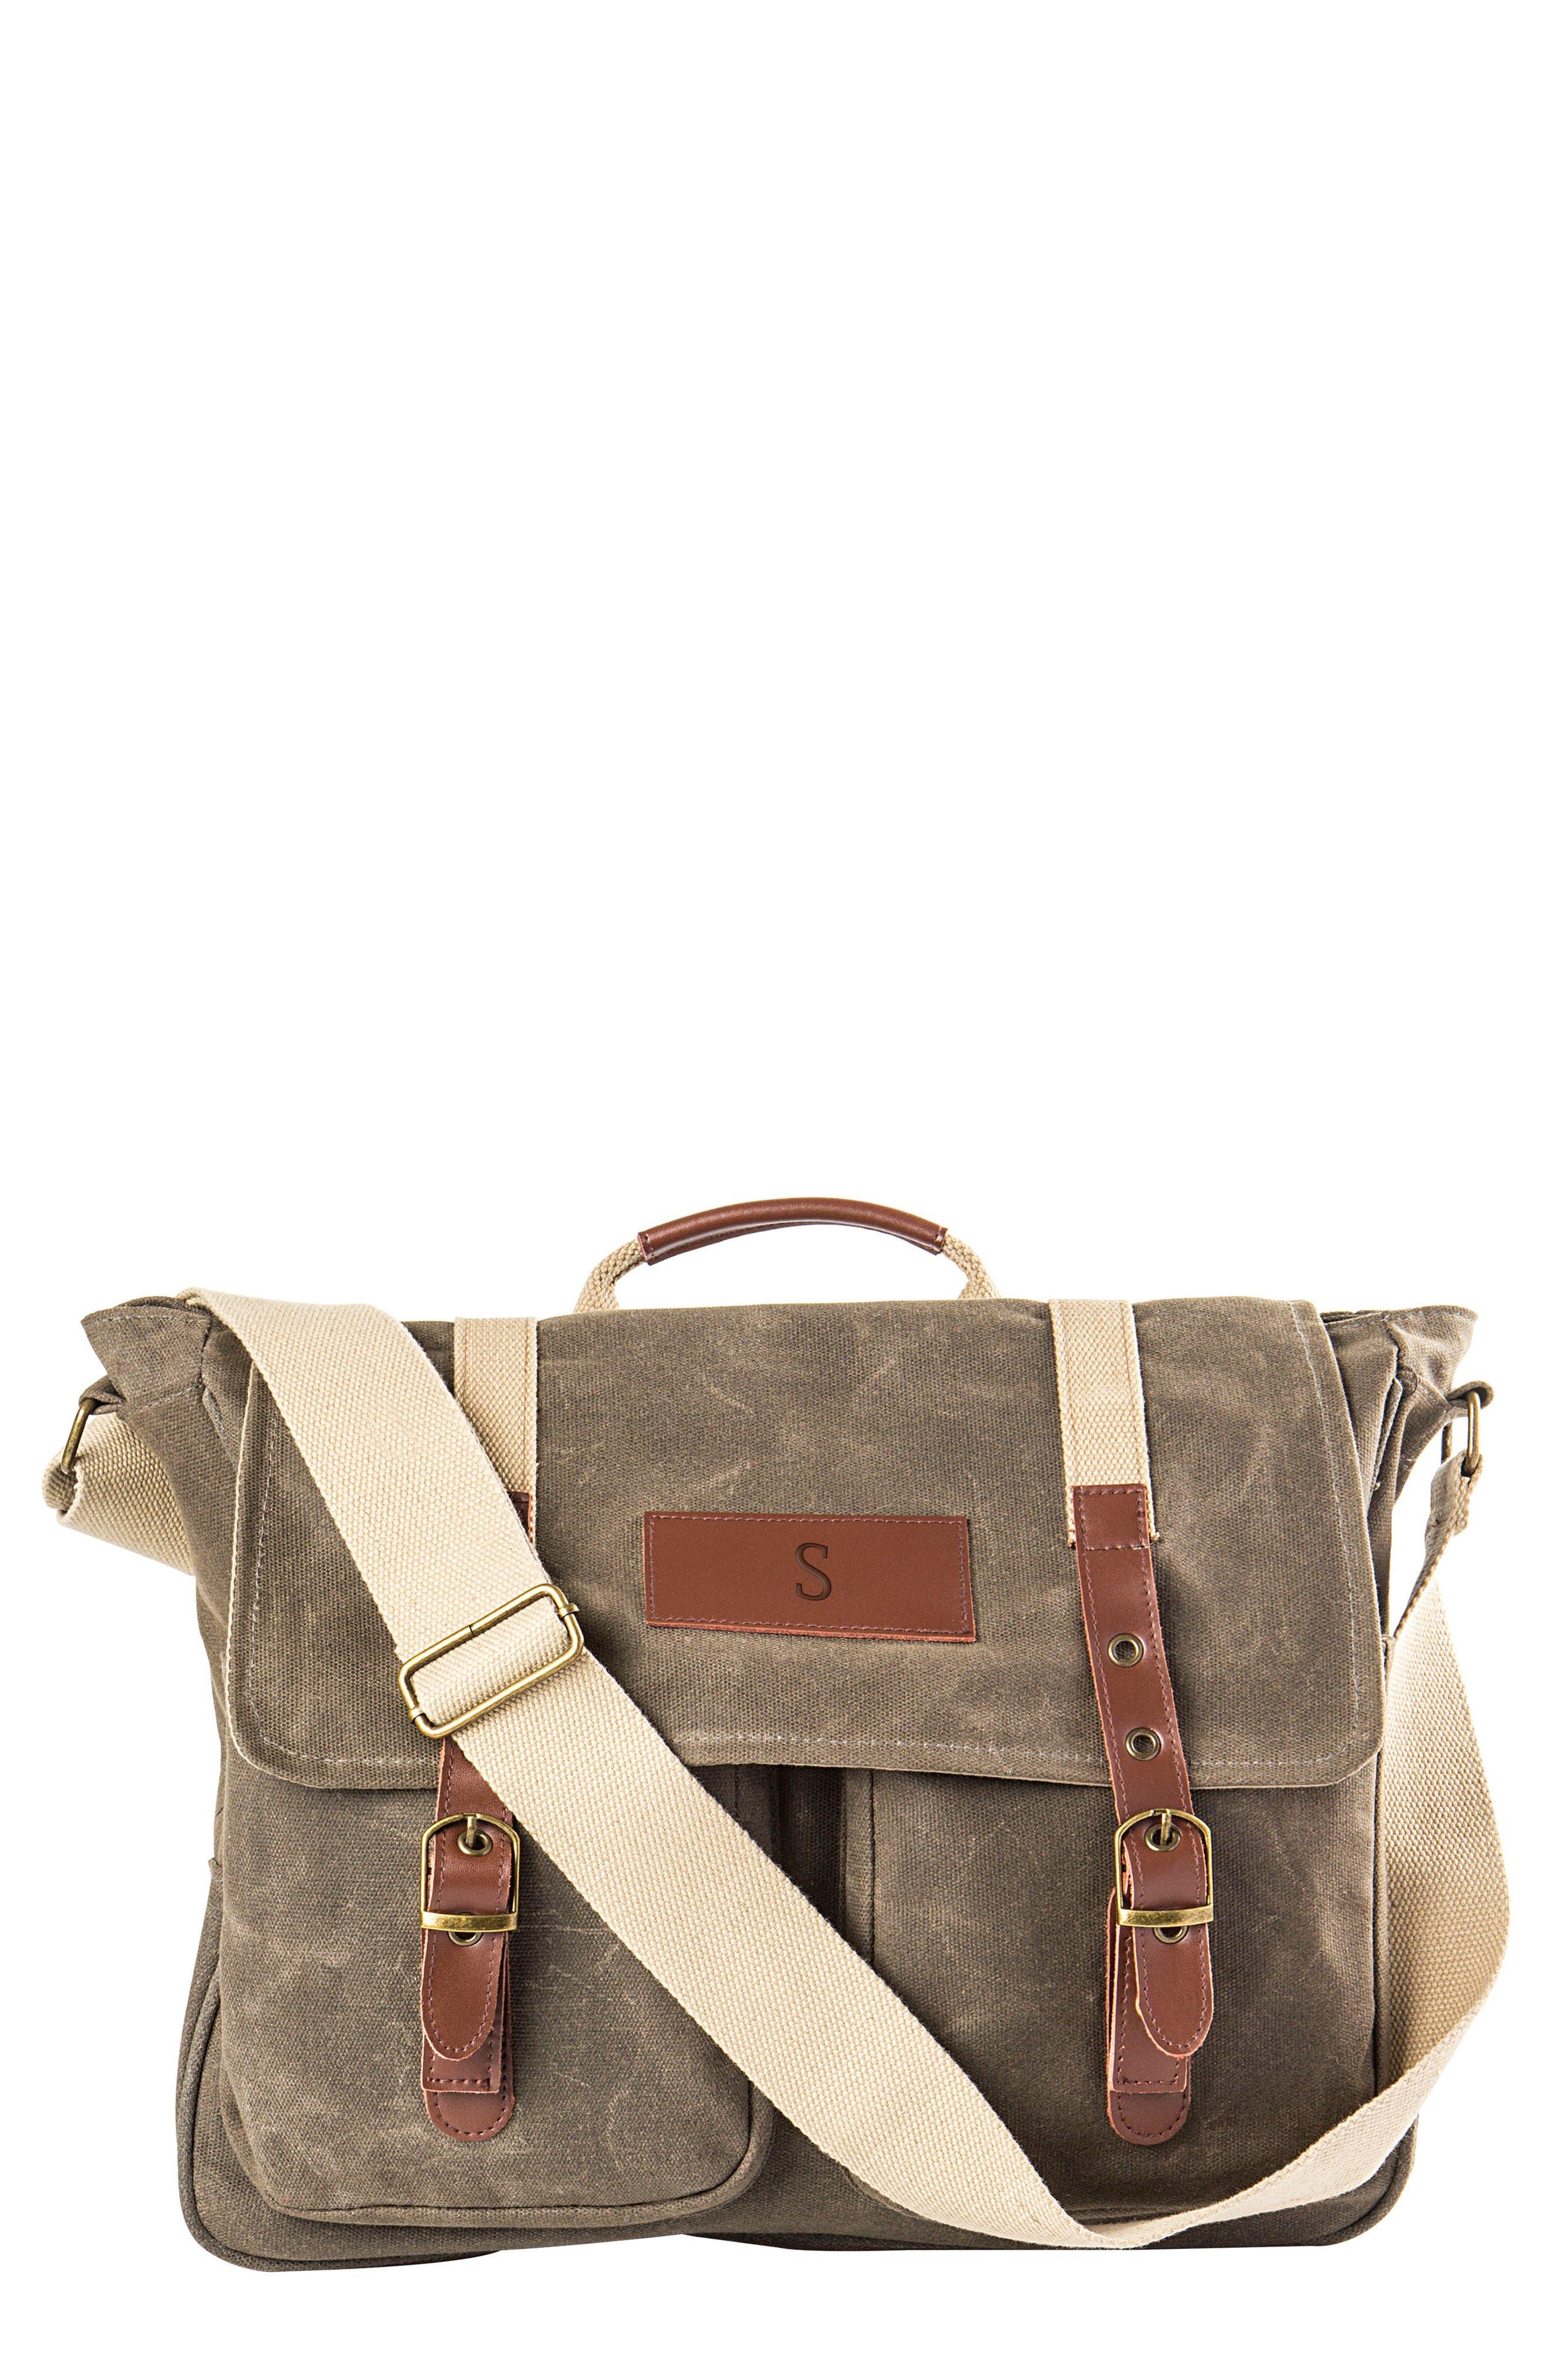 CATHYS CONCEPTS Monogram Messenger Bag